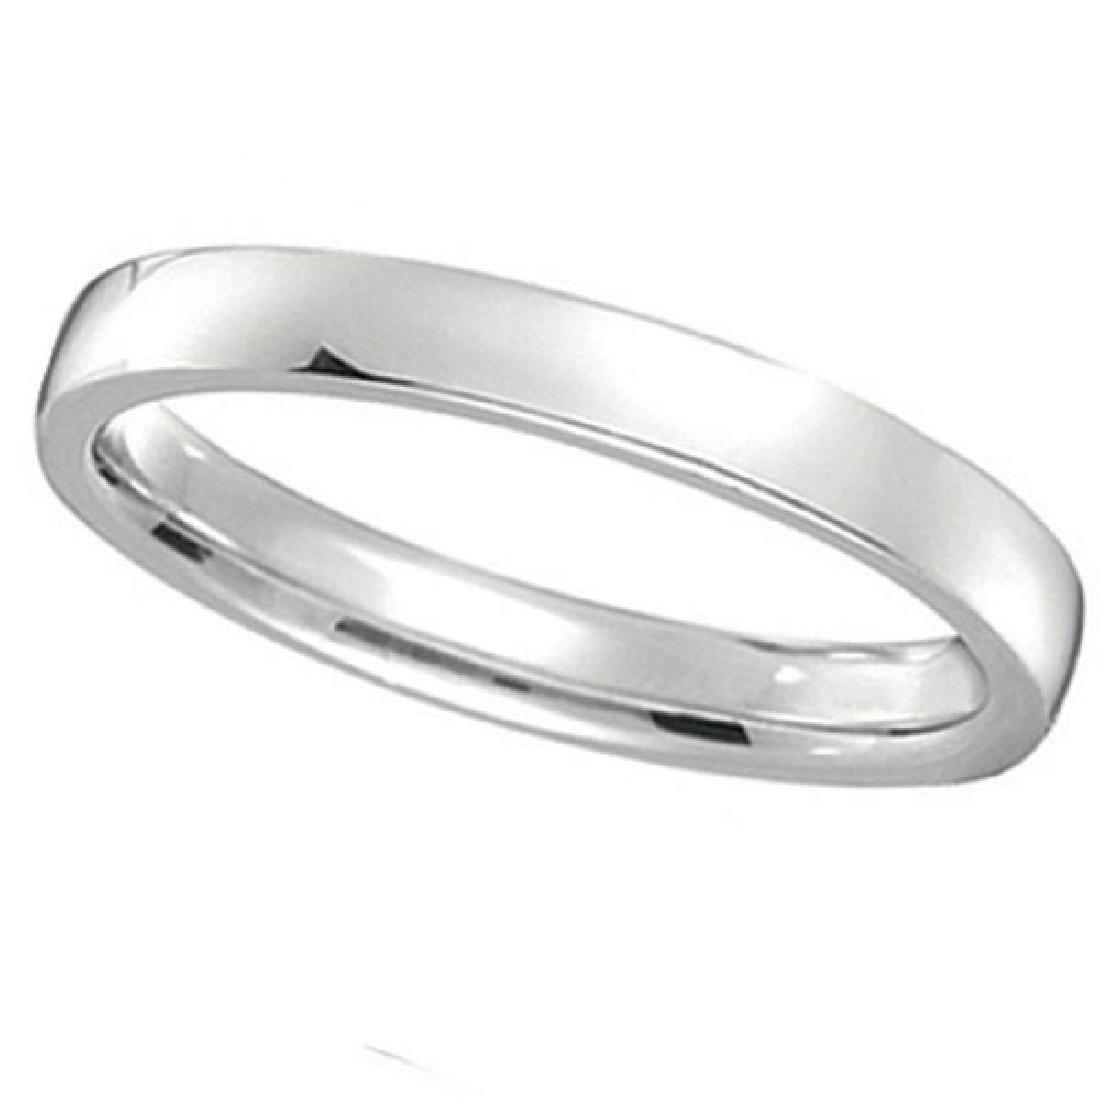 Palladium Wedding Ring Low Dome Comfort Fit (2mm)